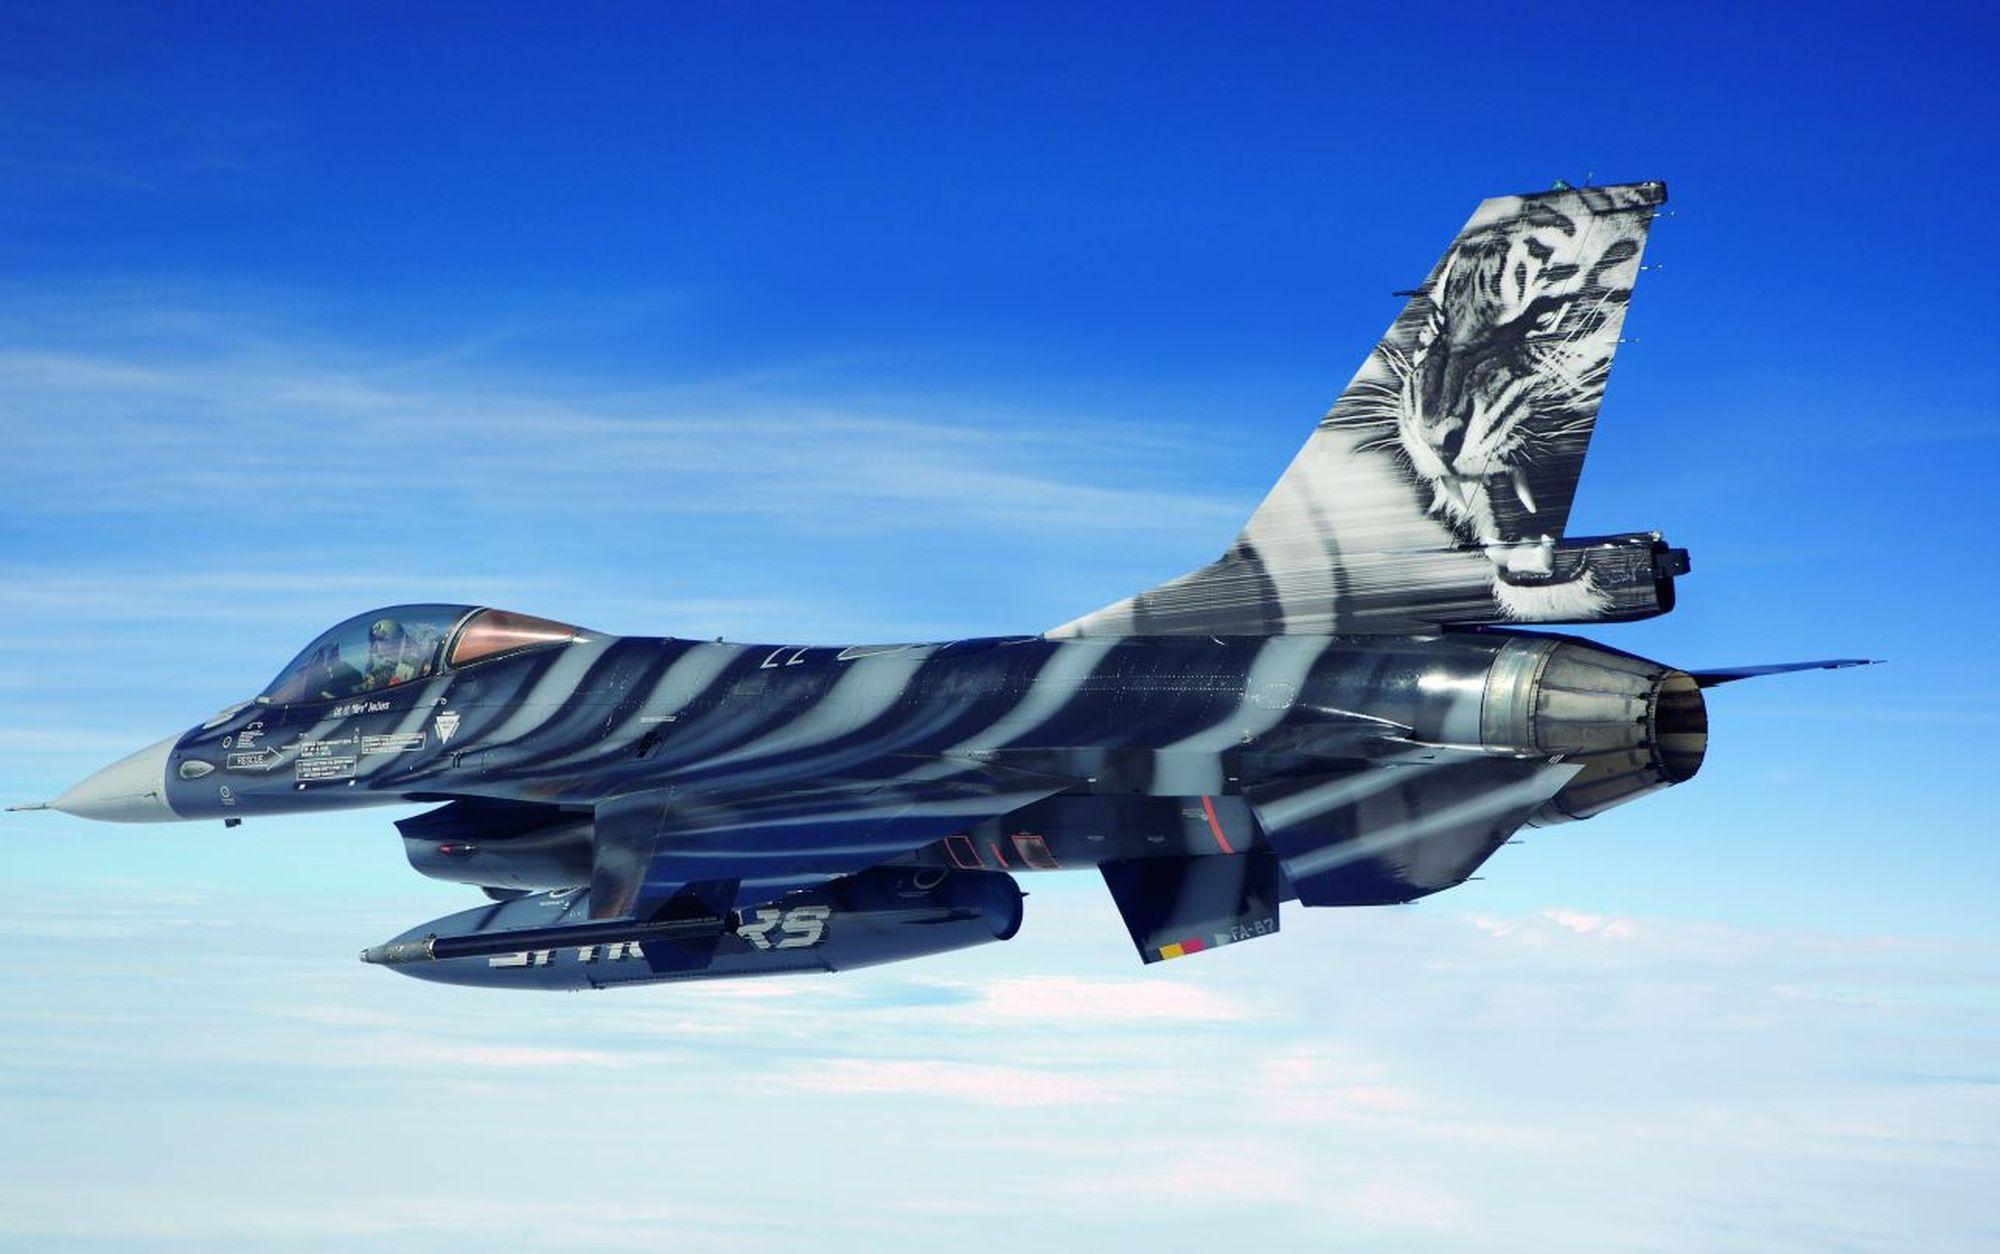 Revell-05671-Gift-Set-NATO-Tiger-Meet-60th-Anniversary_F-16-Mlu-Tigermeet_A Revell Neuheiten 2021